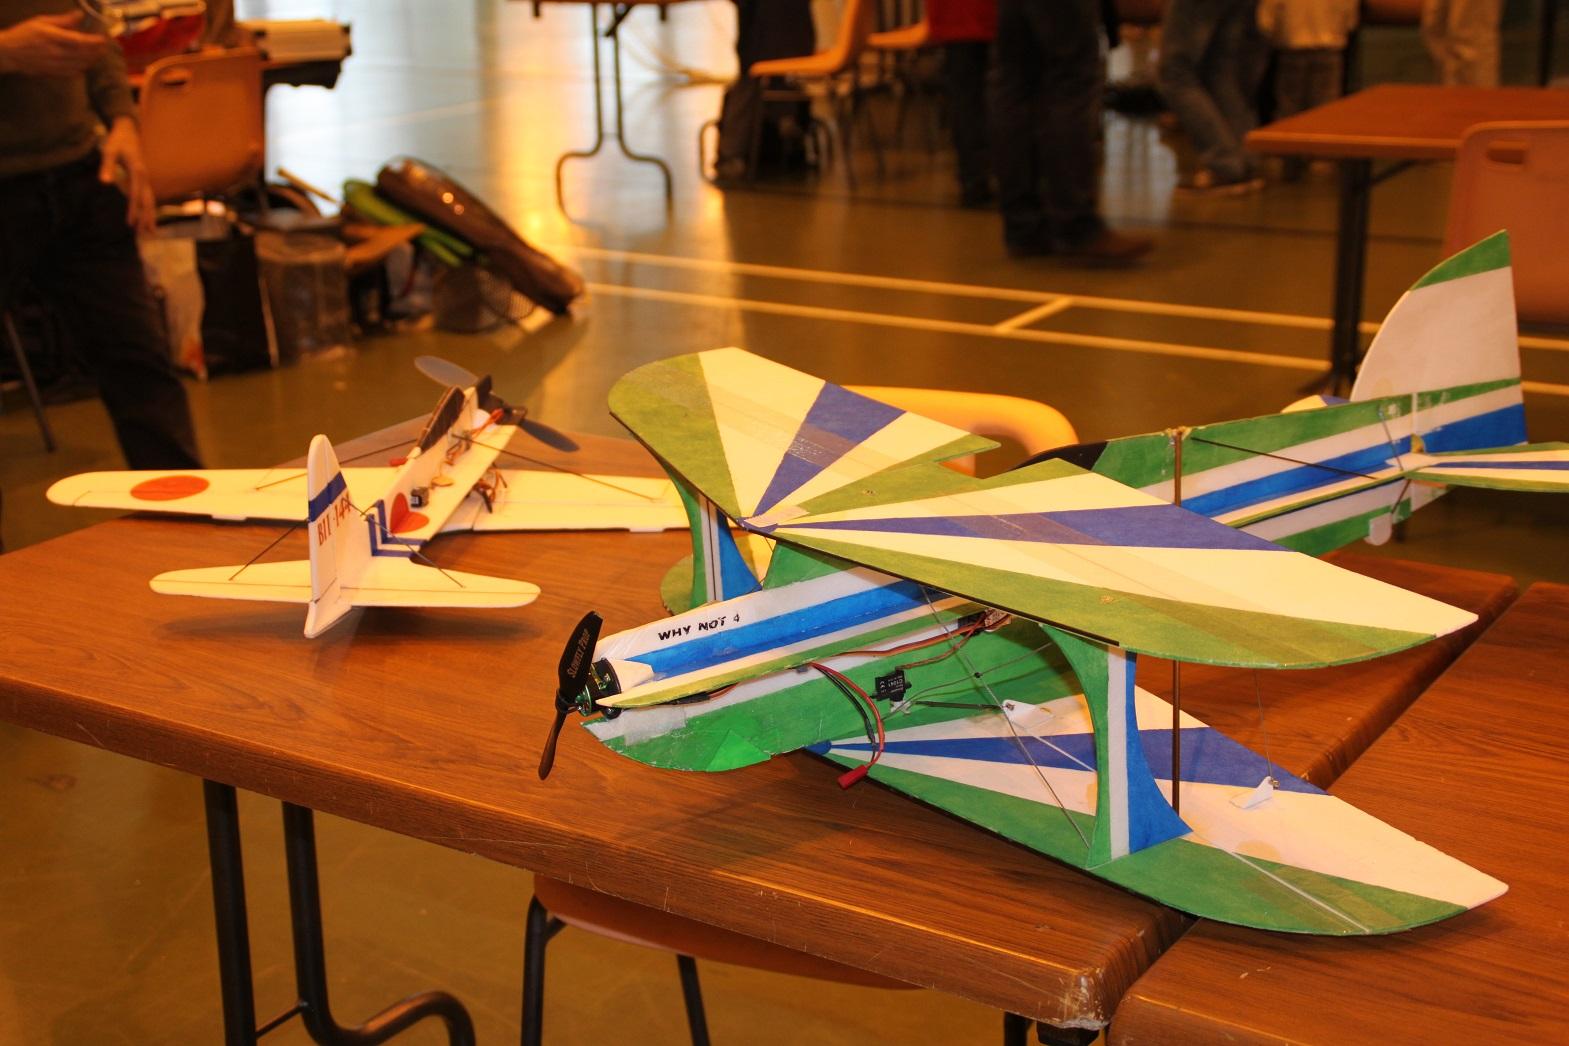 Rencontres aeromodelisme